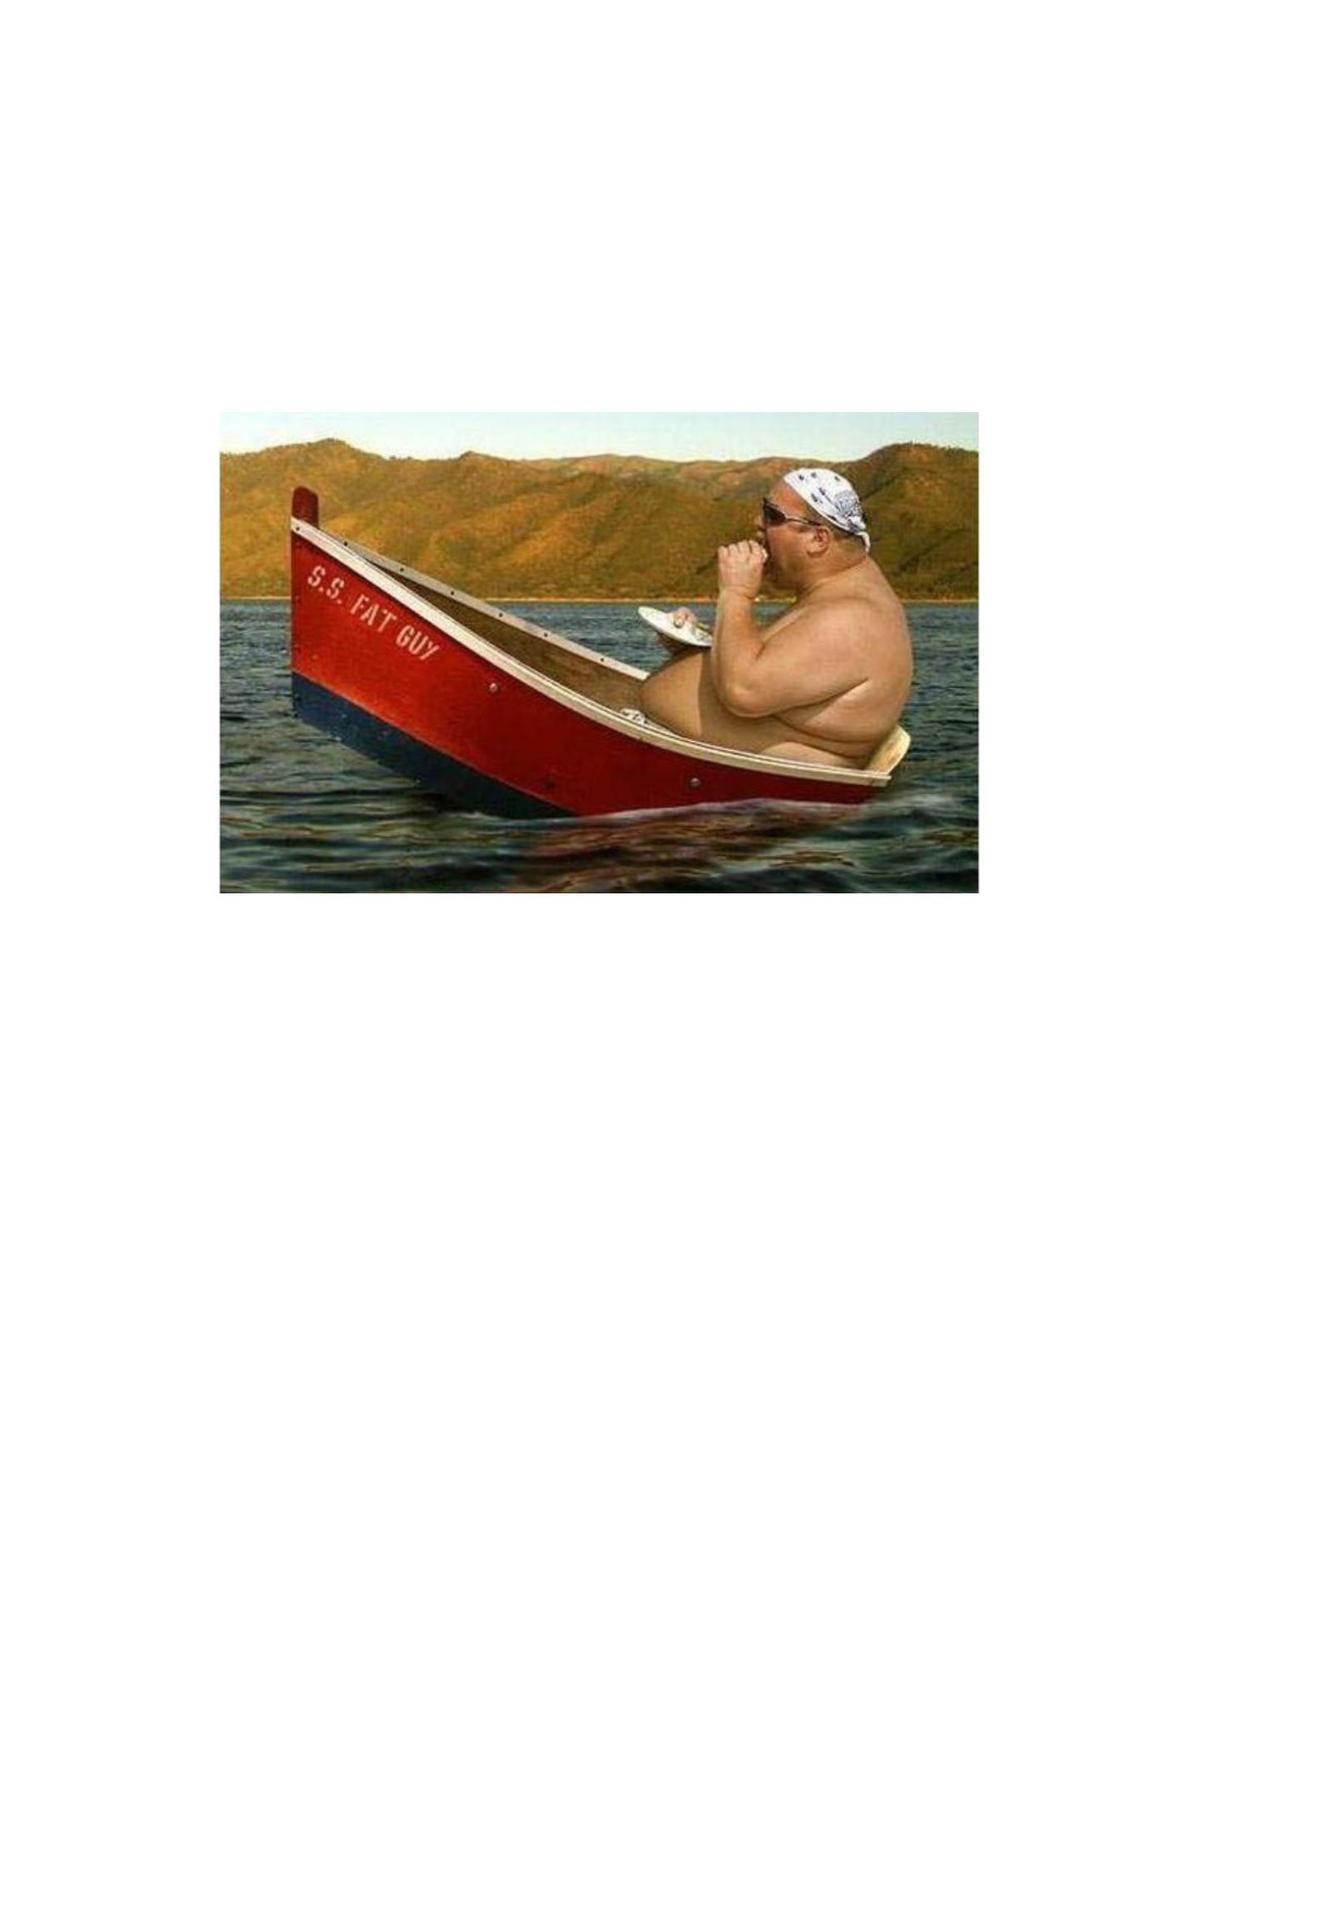 Click image for larger version.  Name:fatguy_boat.jpg Views:64 Size:67.6 KB ID:150075